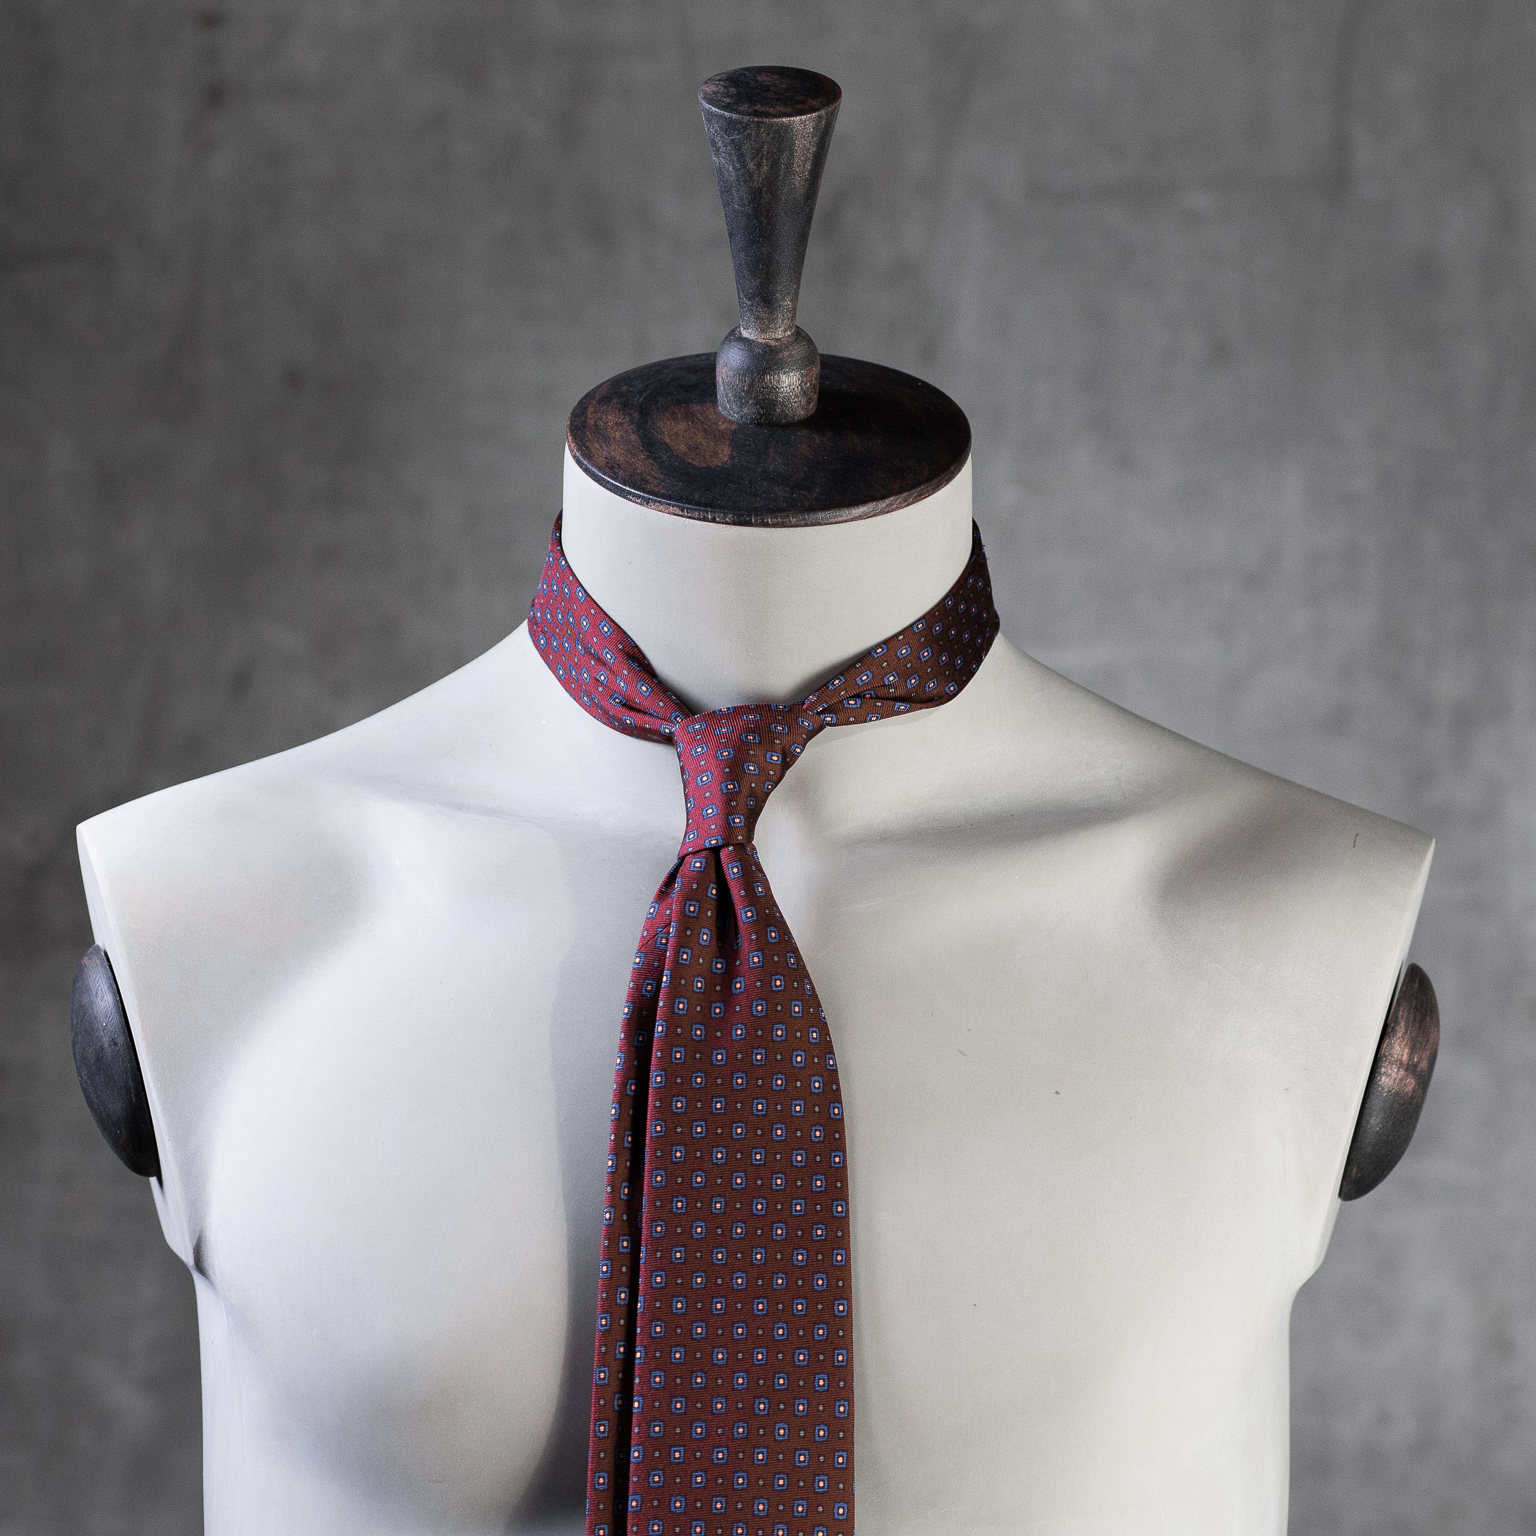 PRINTED-SILK-SEDA-ESTAMPADA-0587-Tie-Initials-Corbata-Iniciales-The-Seëlk-2